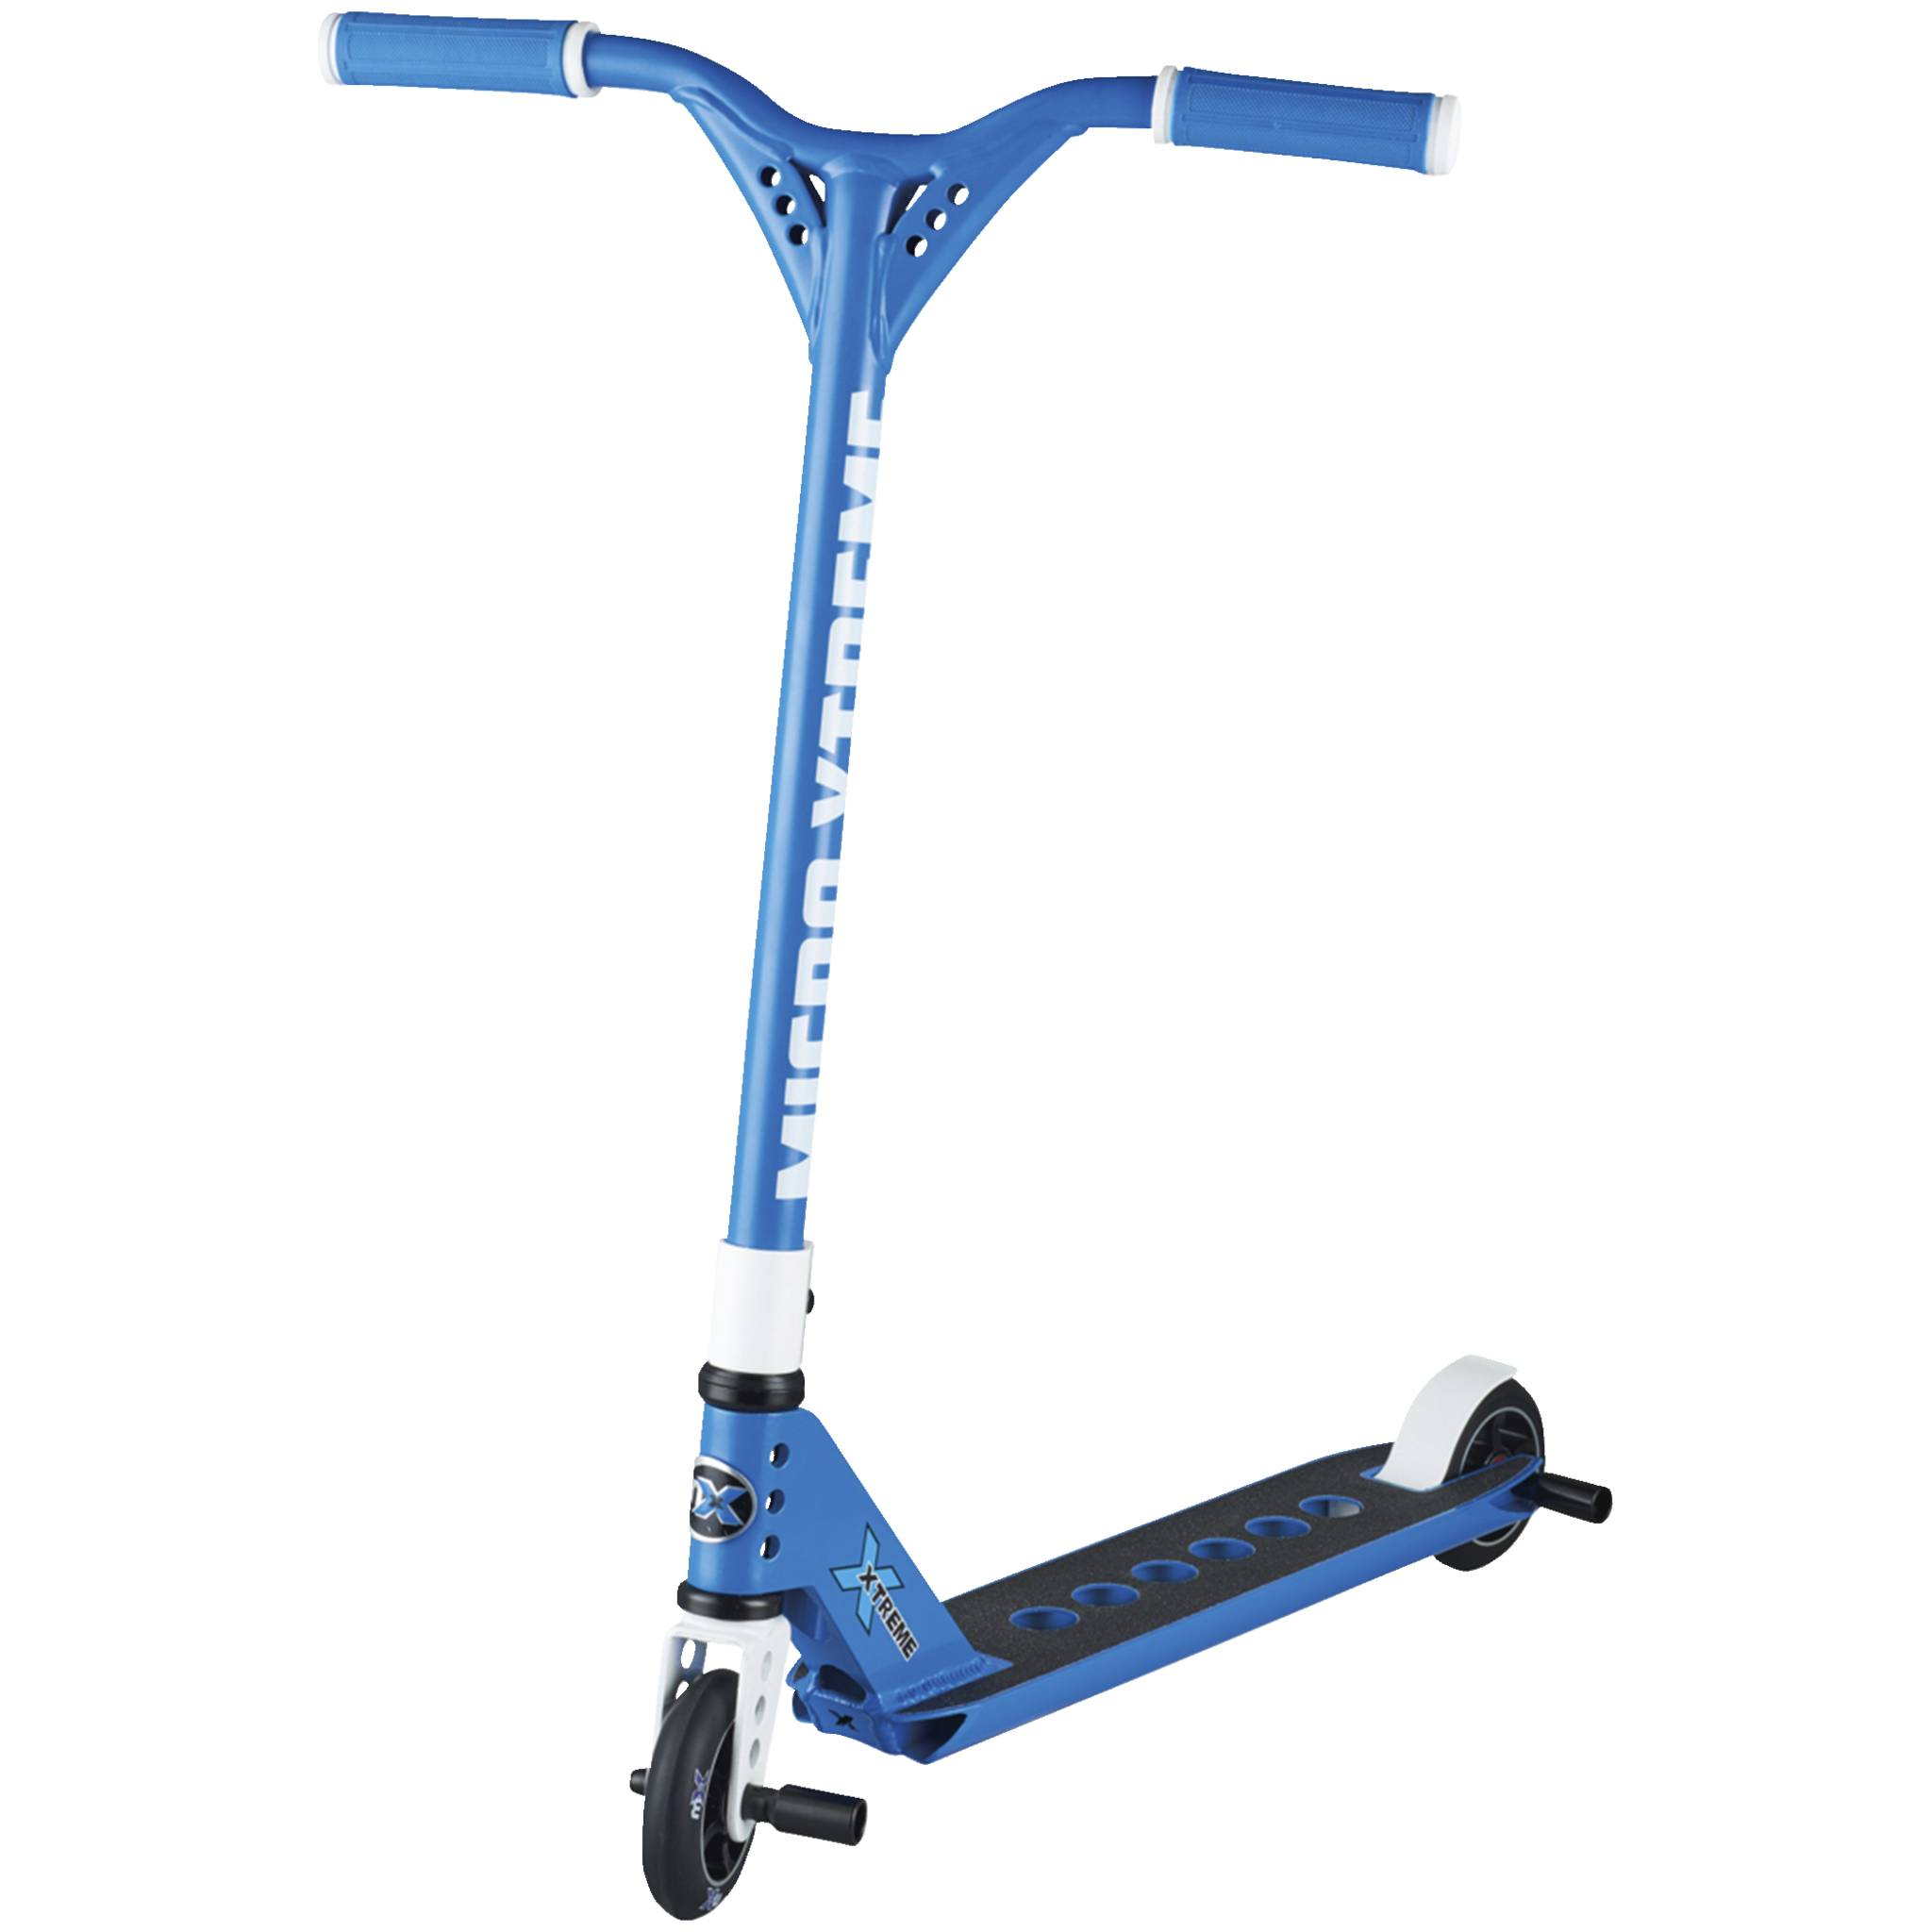 Micro MX Trixx 2.0, triksesparkesykkel